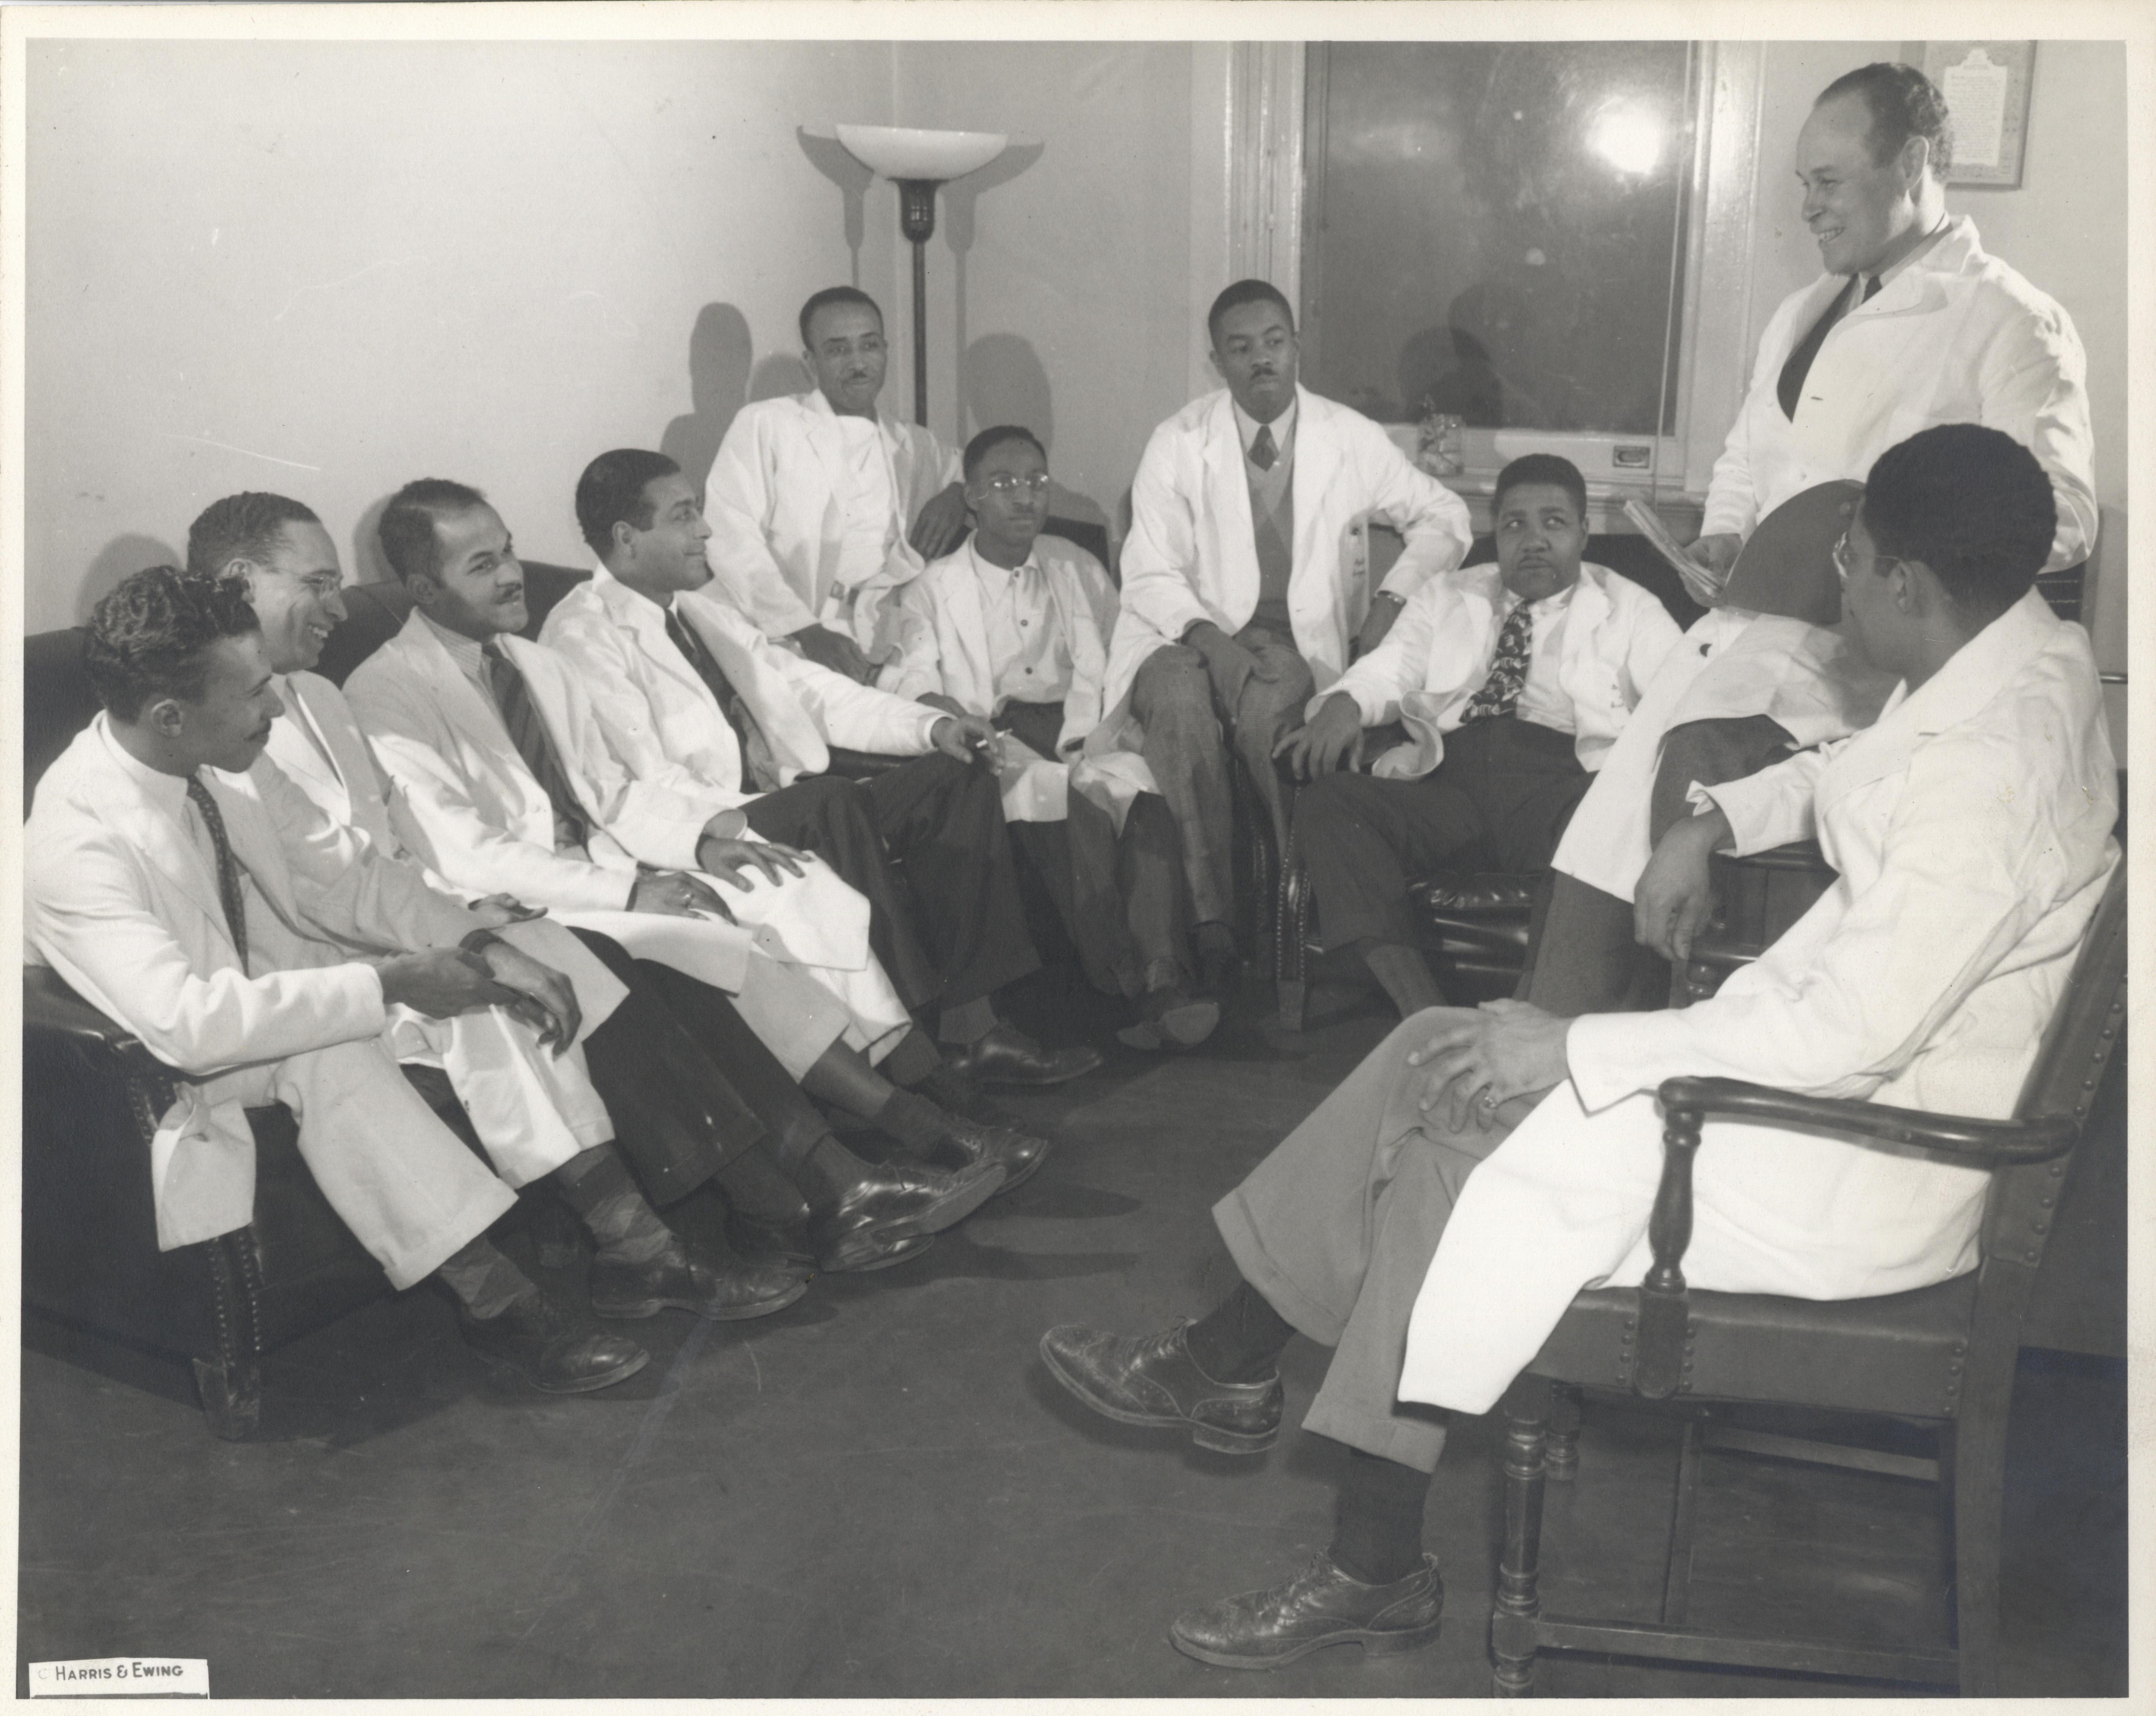 Dr. Charles R. Drew Health Center